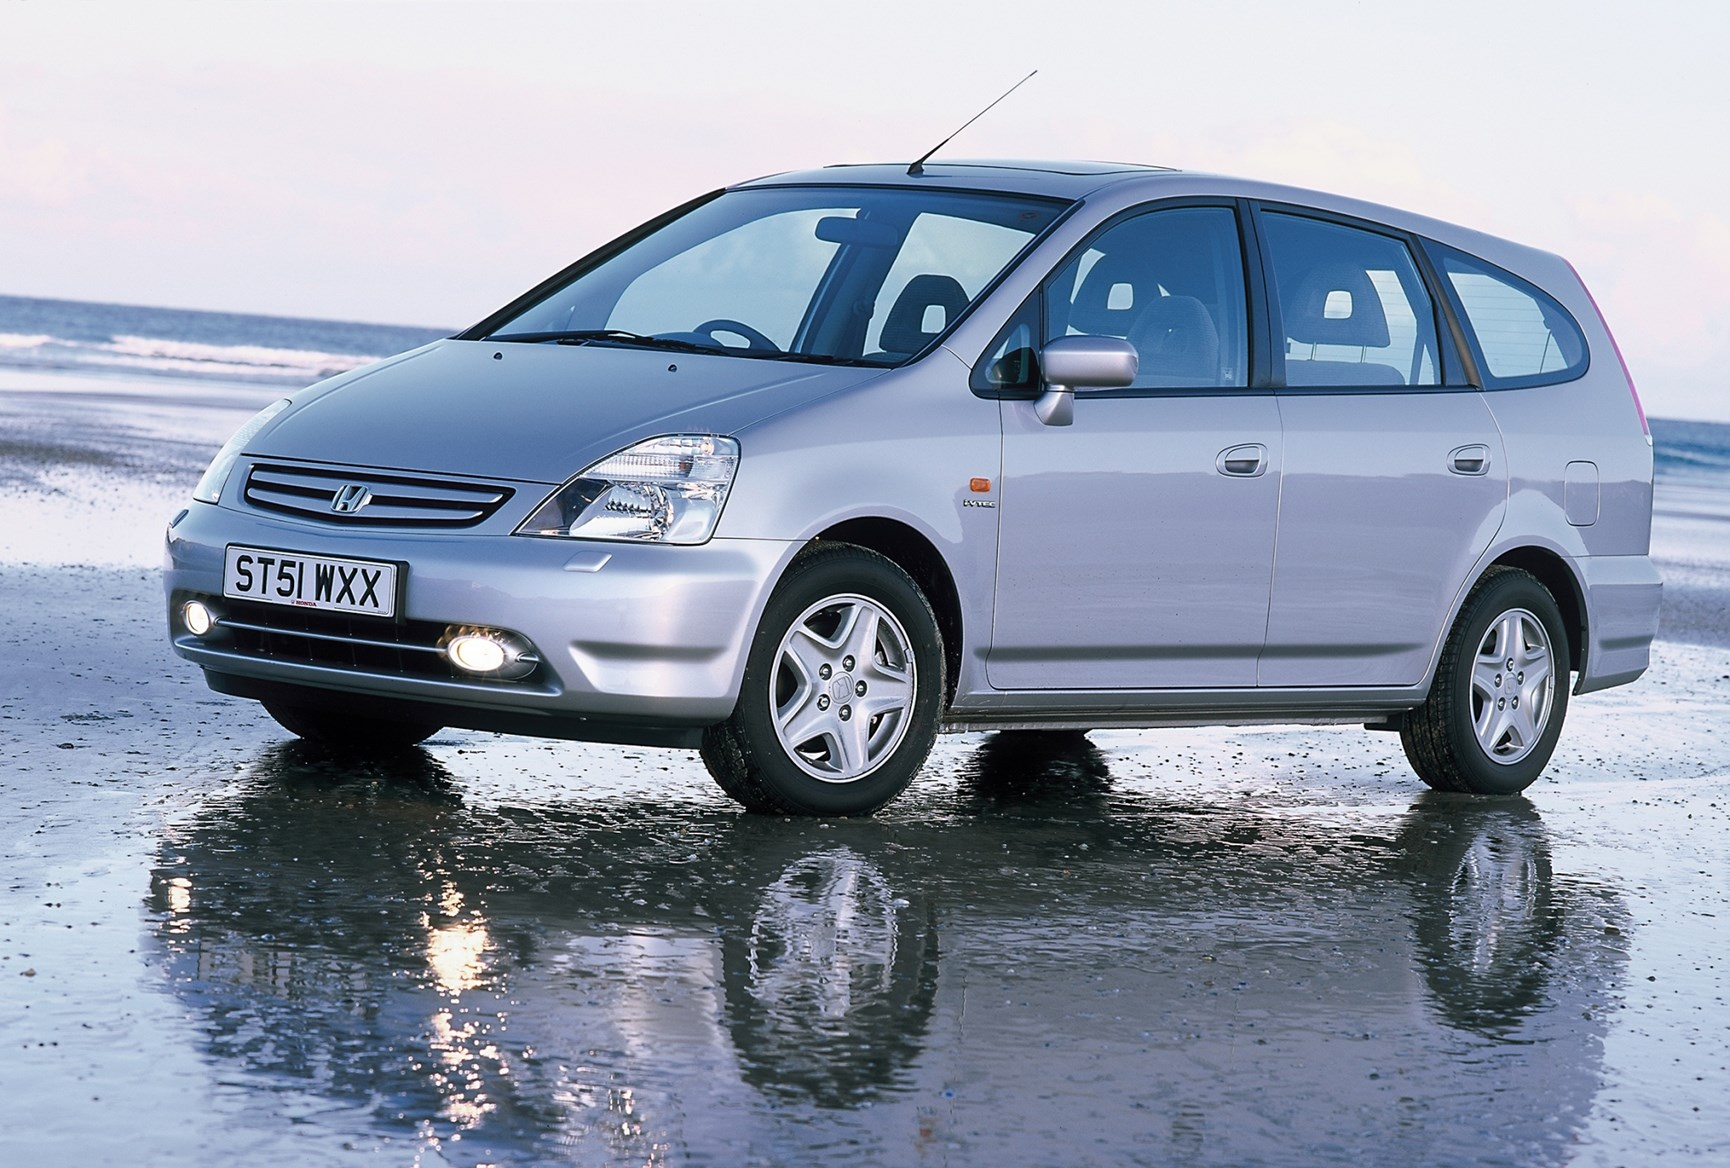 Kekurangan Honda Stream 2001 Murah Berkualitas